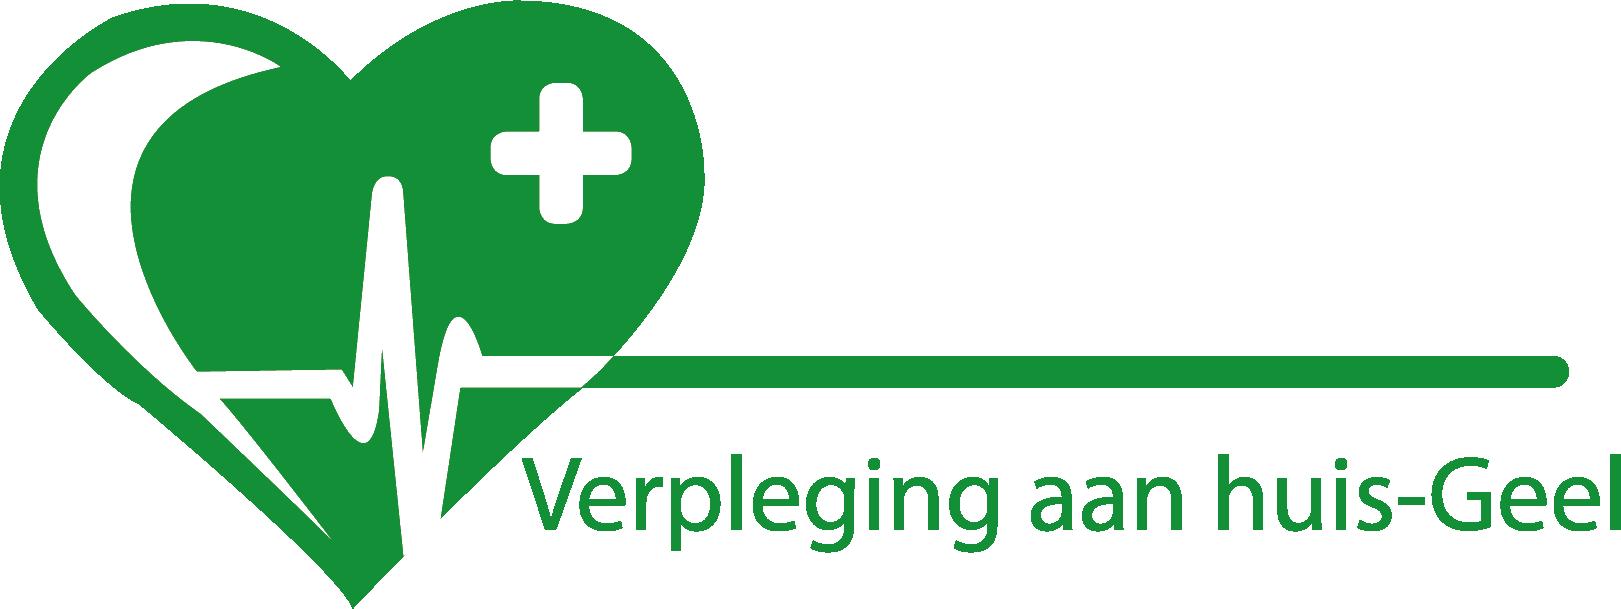 Verpleging aan huis Geel Verpleger Thuisverpleging Holven Ten Aard Oosterlo Meerhout Bel Larum Punt